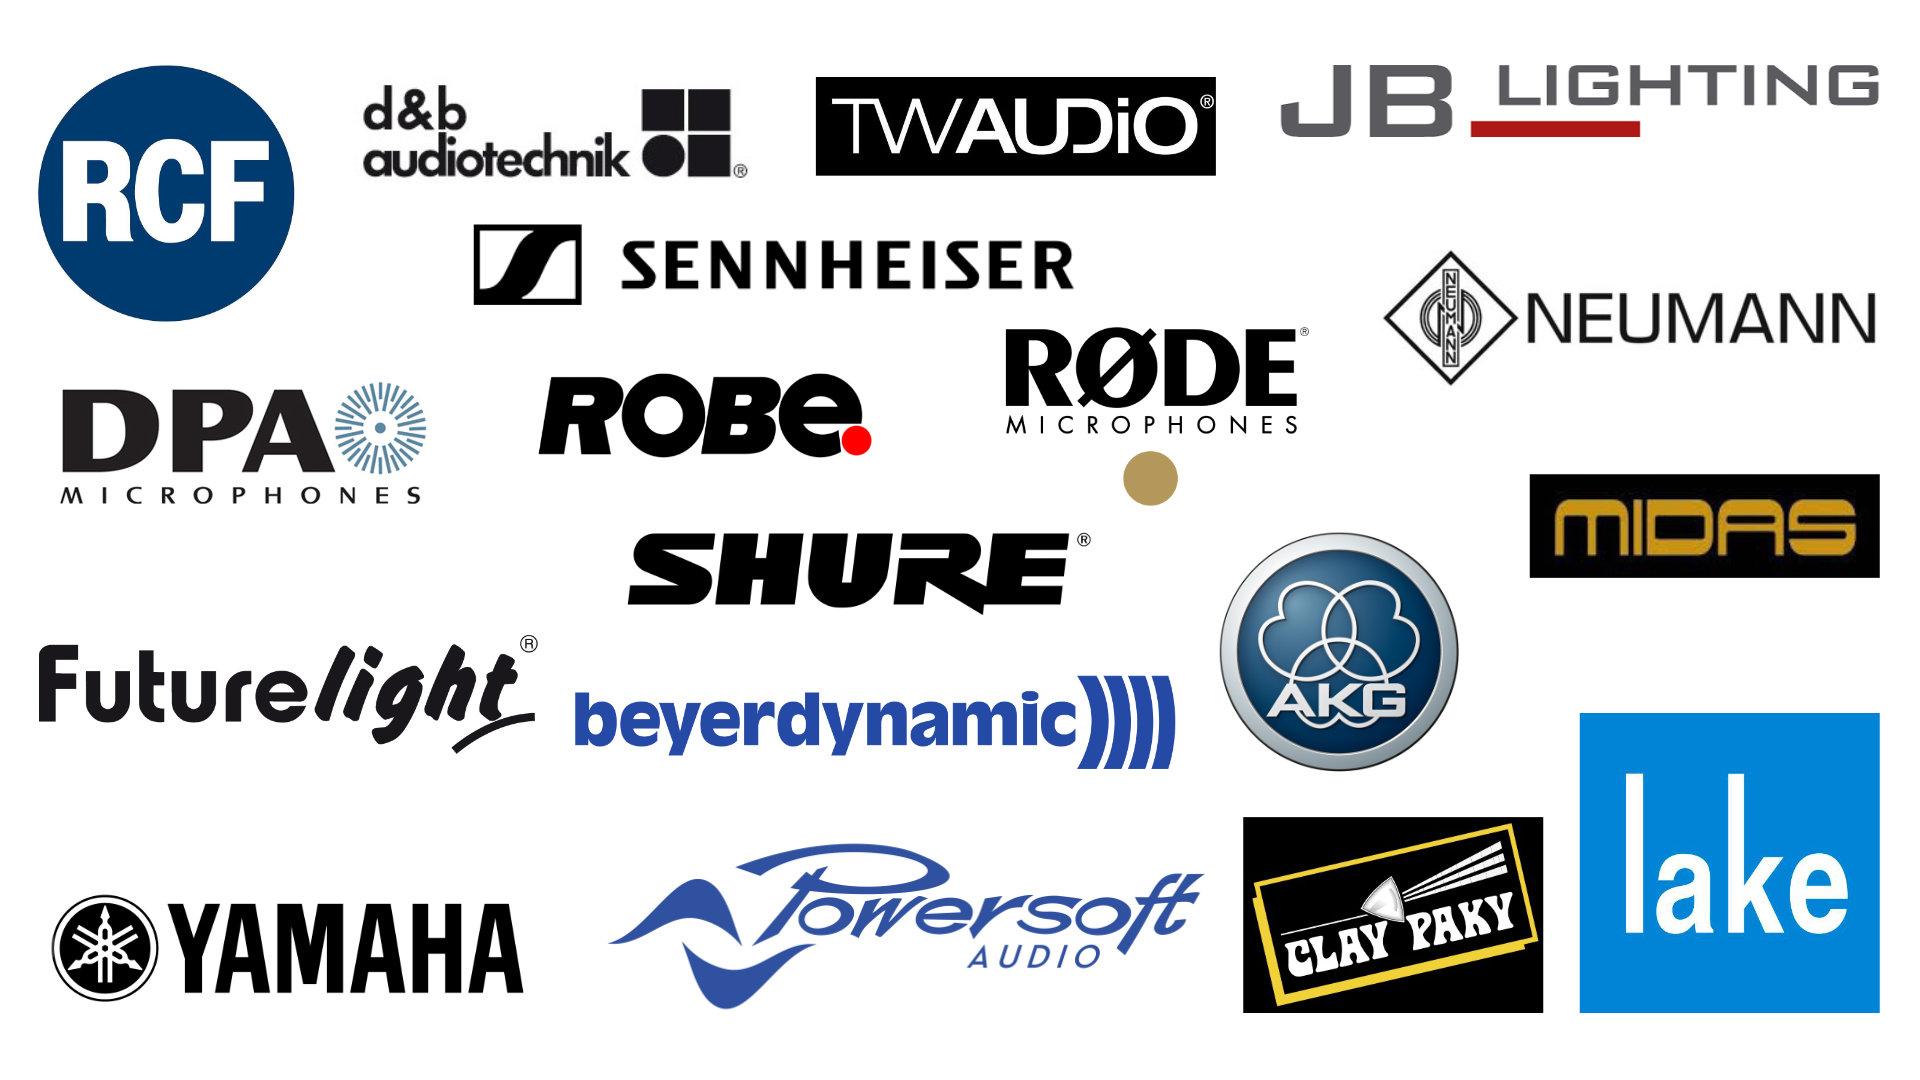 TW Audio, D&B, RCF, Lake, Powersoft, Midas, Yamaha, Shure, Bayerdynamic, Sennheisser, Neumann, AKG, Rode, JB-Lighting, Futurelight, Robe, Clay Packy, Panasonic usw.